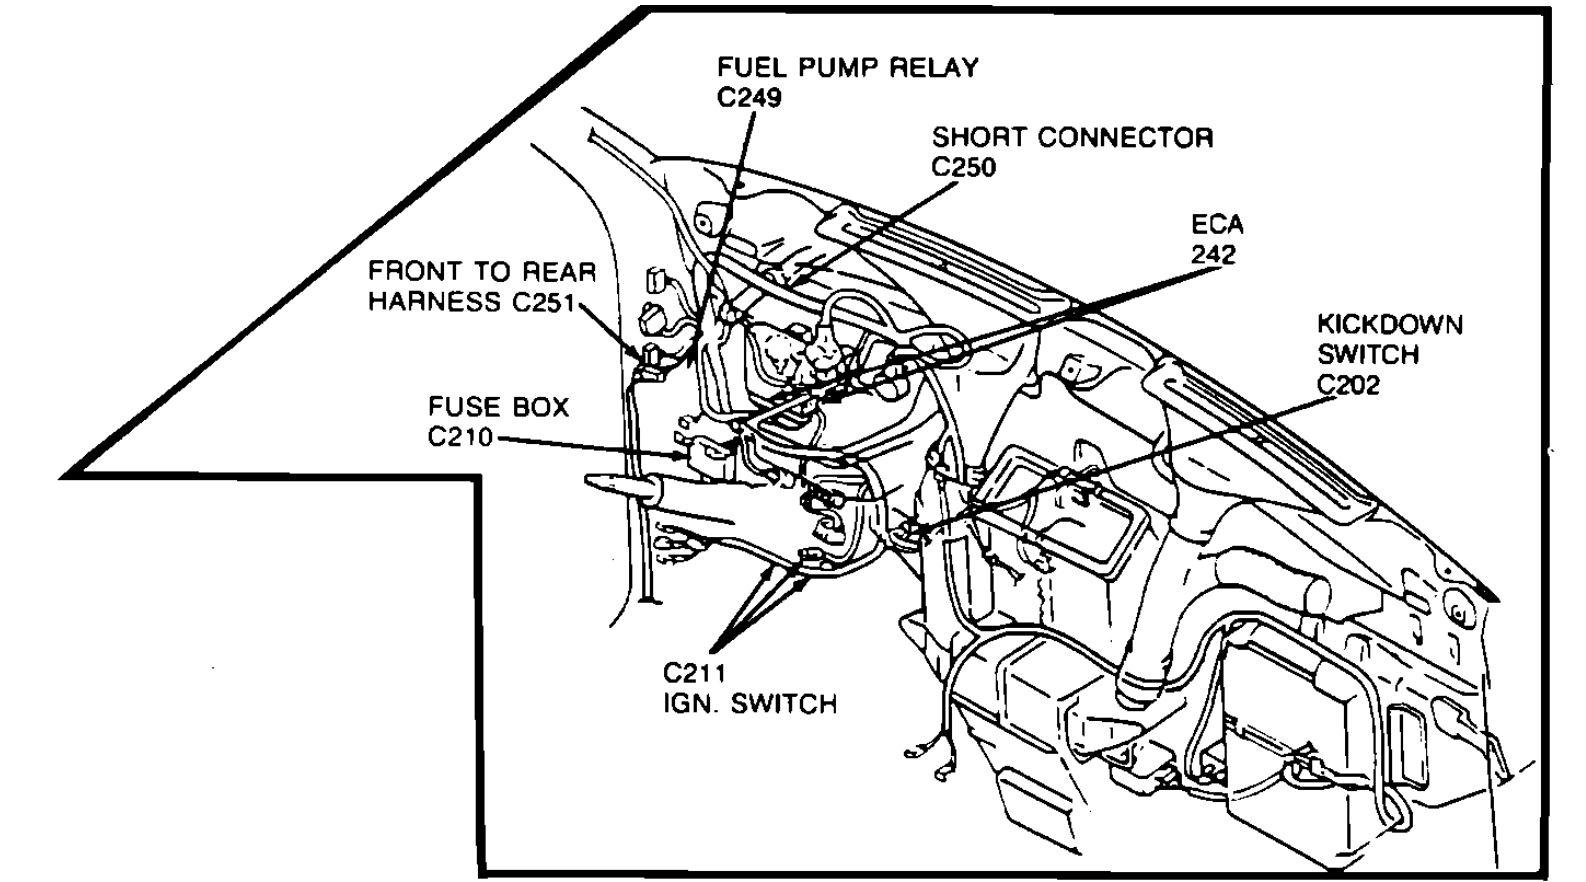 mazda 121 fuse box - wiring diagram oil-data-b - oil-data-b.disnar.it  disnar.it